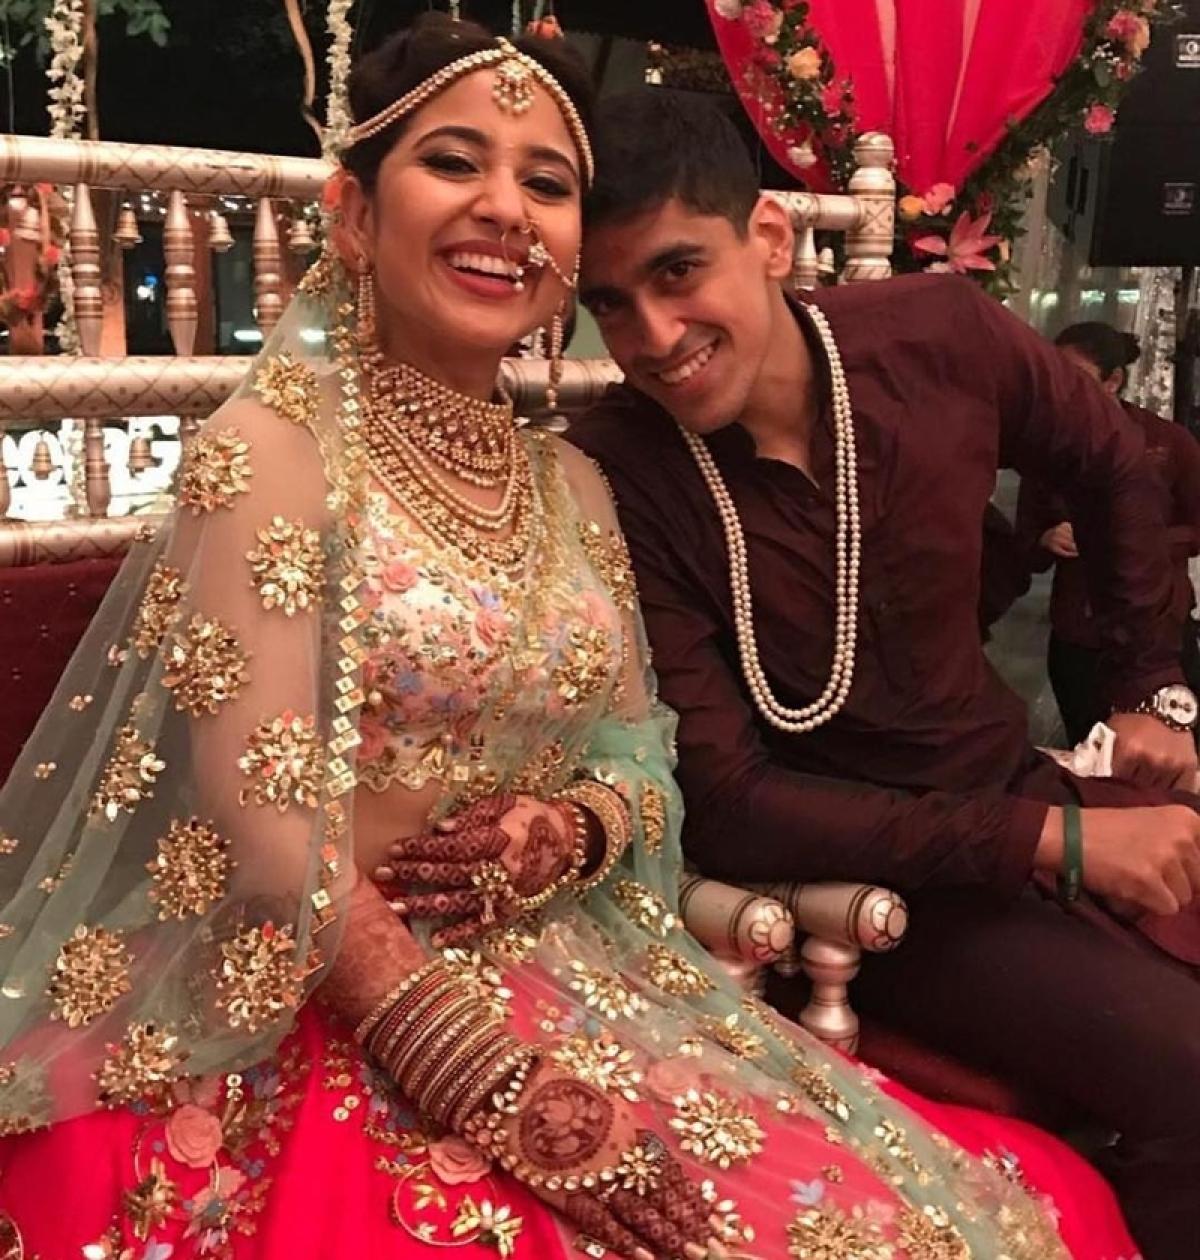 See Pics: Shweta Tripathi and Chaitnya Sharma are the cutest married couple